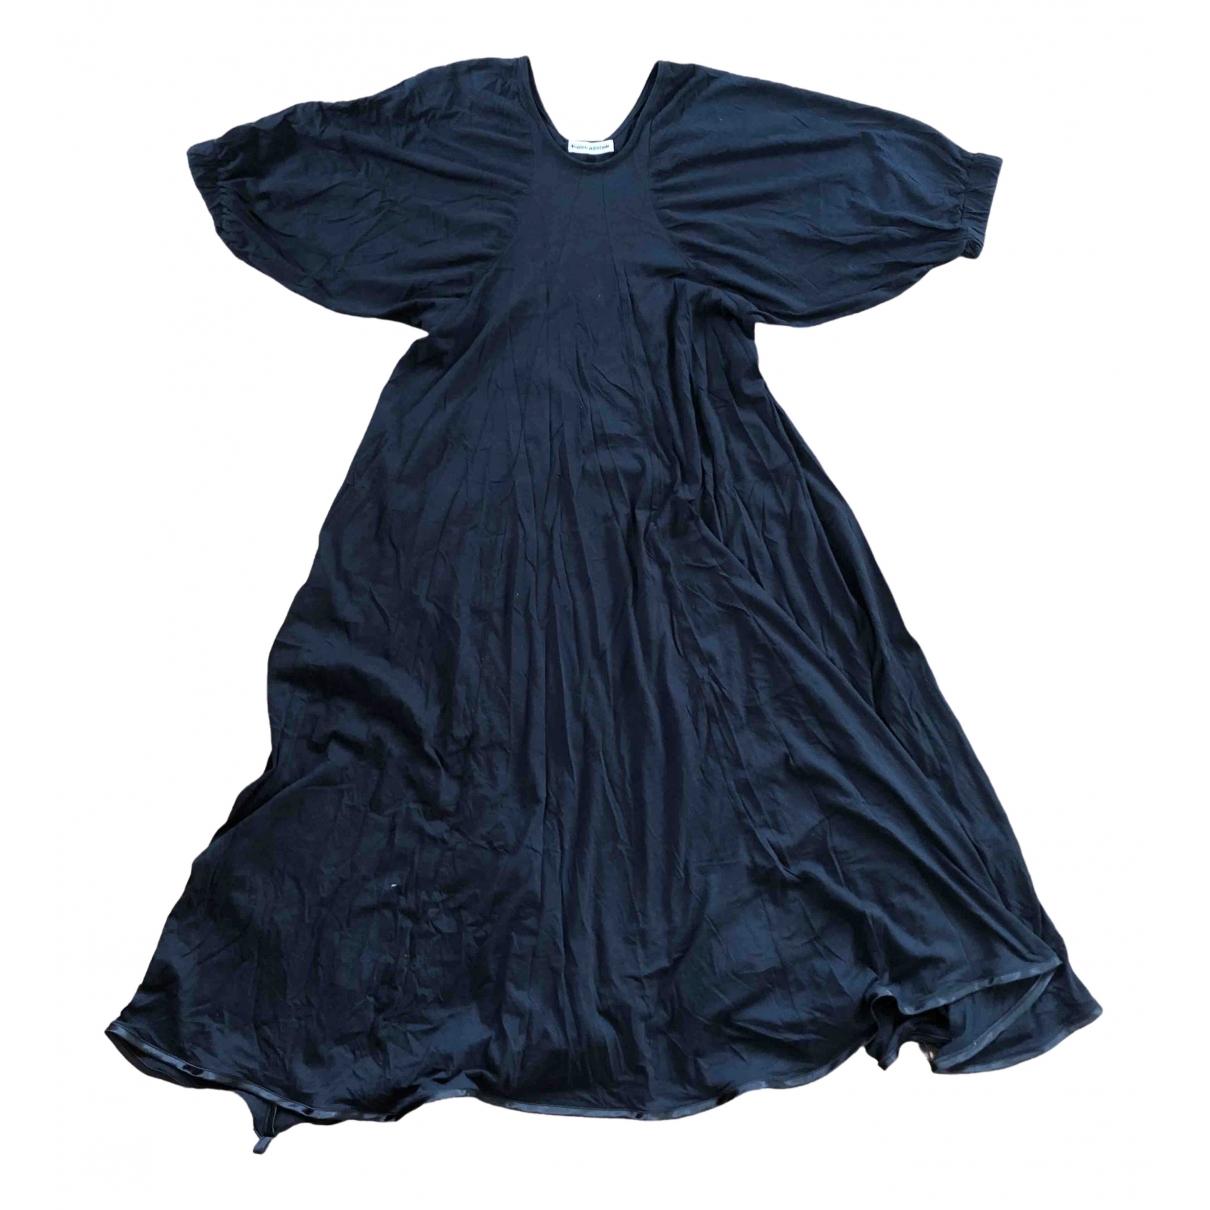 Carin Wester \N Kleid in  Schwarz Baumwolle